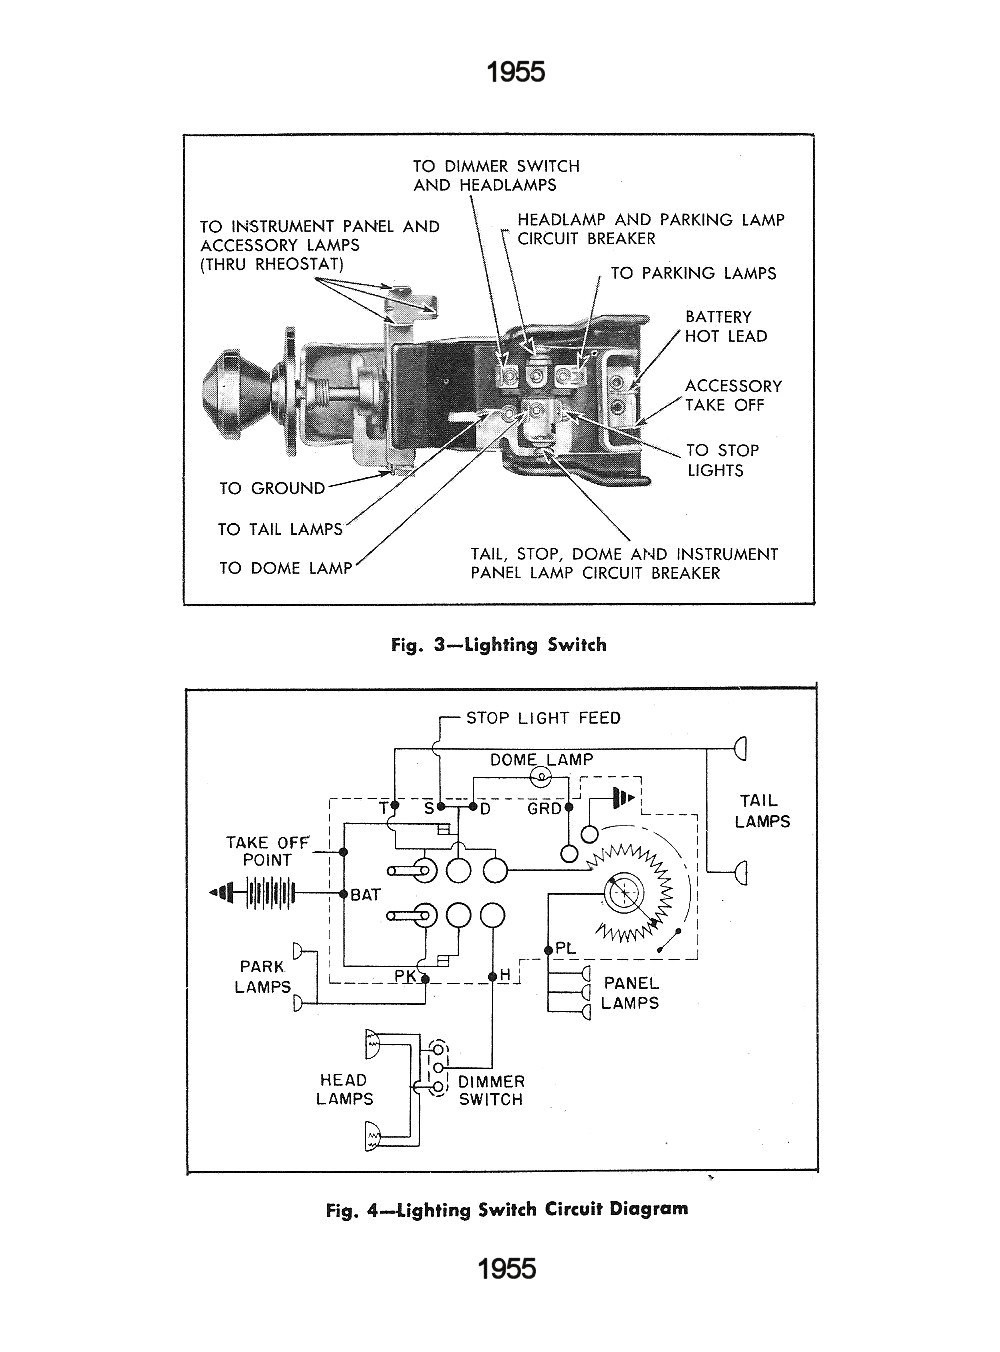 56 bell air wiring diagram dr 2006  wiring diagram likewise 1955 chevy rear end diagram  wiring diagram likewise 1955 chevy rear